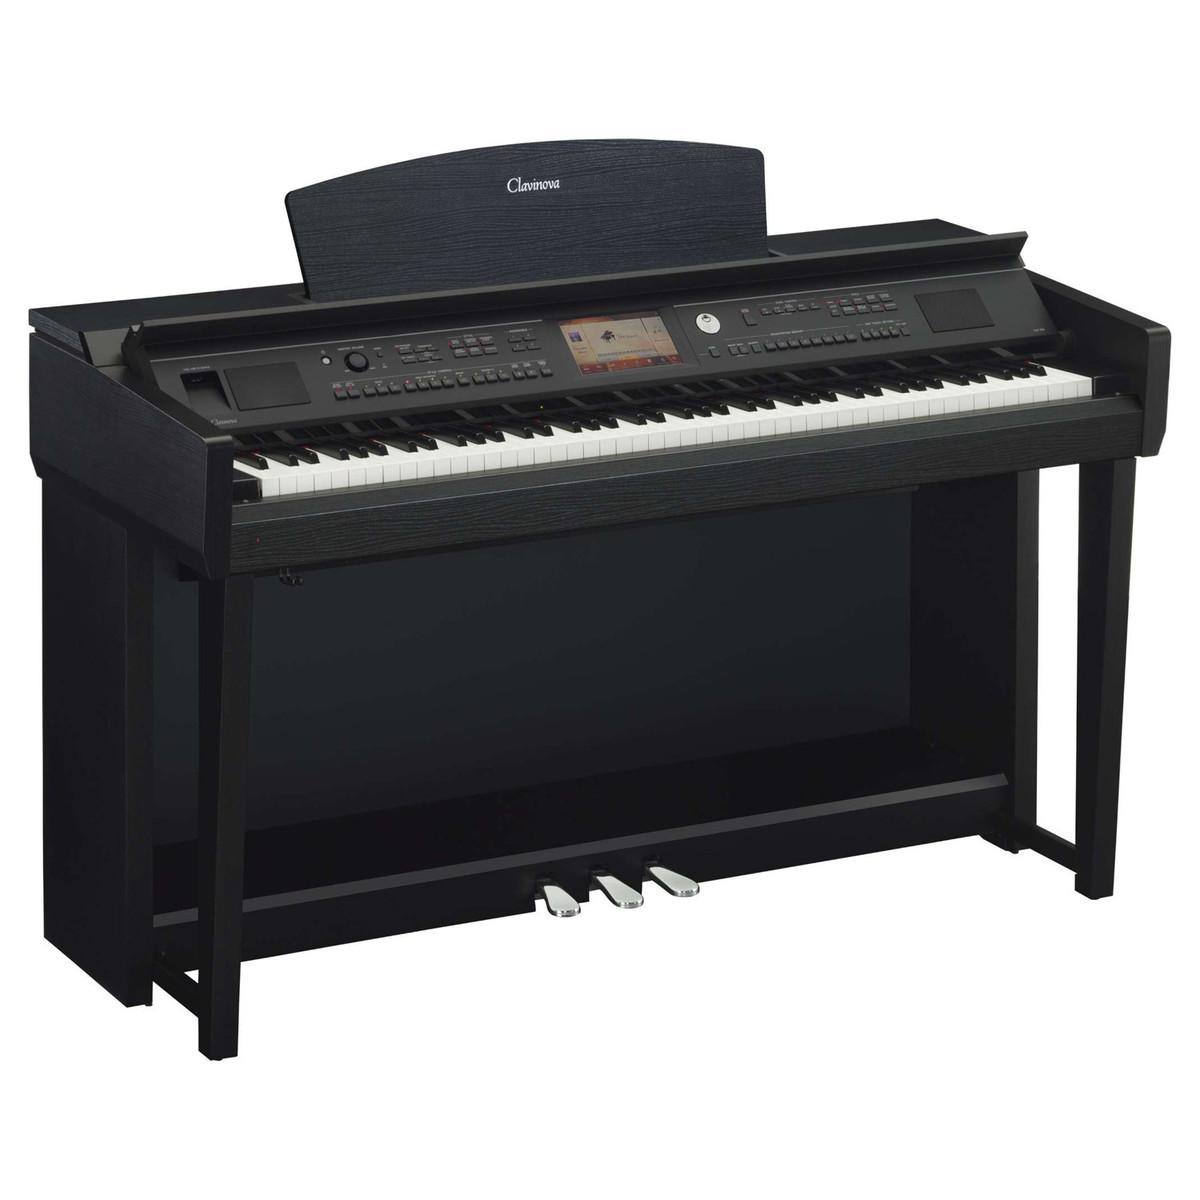 Yamaha cvp 705 clavinova digital piano black walnut at for Yamaha digital piano clavinova